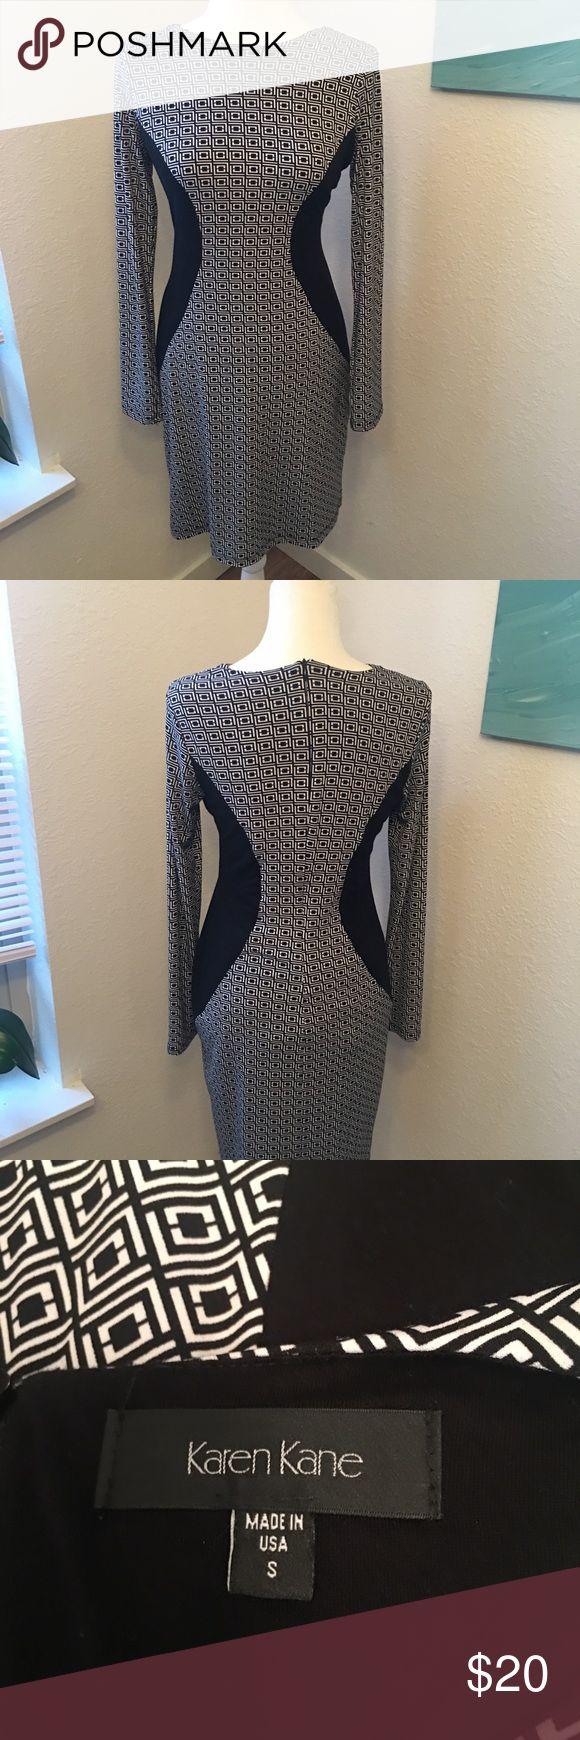 Karen Kane waist flattering dress Karen Kane waist flattering dress. Lined. Karen Kane Dresses Long Sleeve